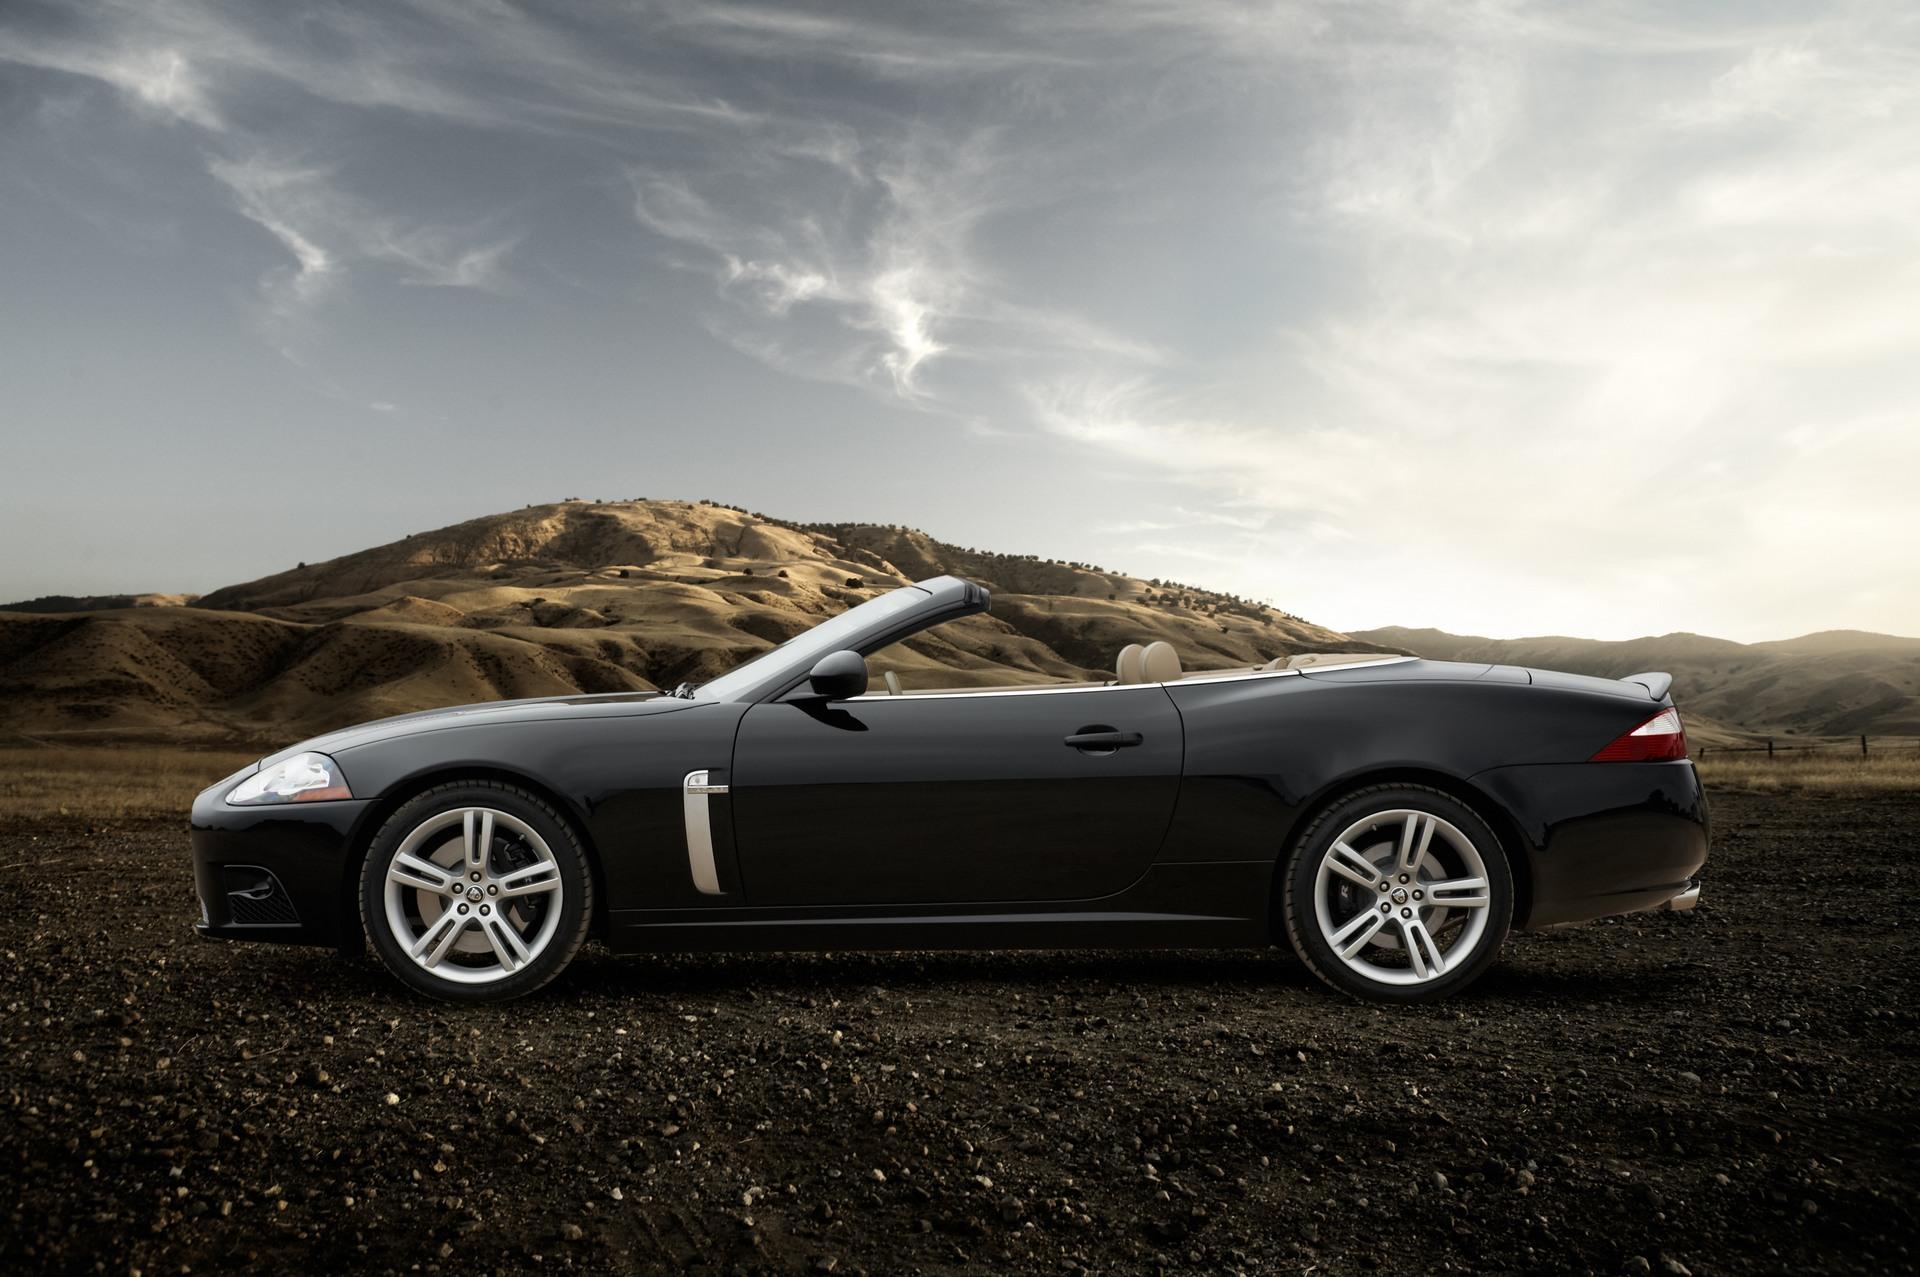 2008 jaguar xk conceptcarzcom